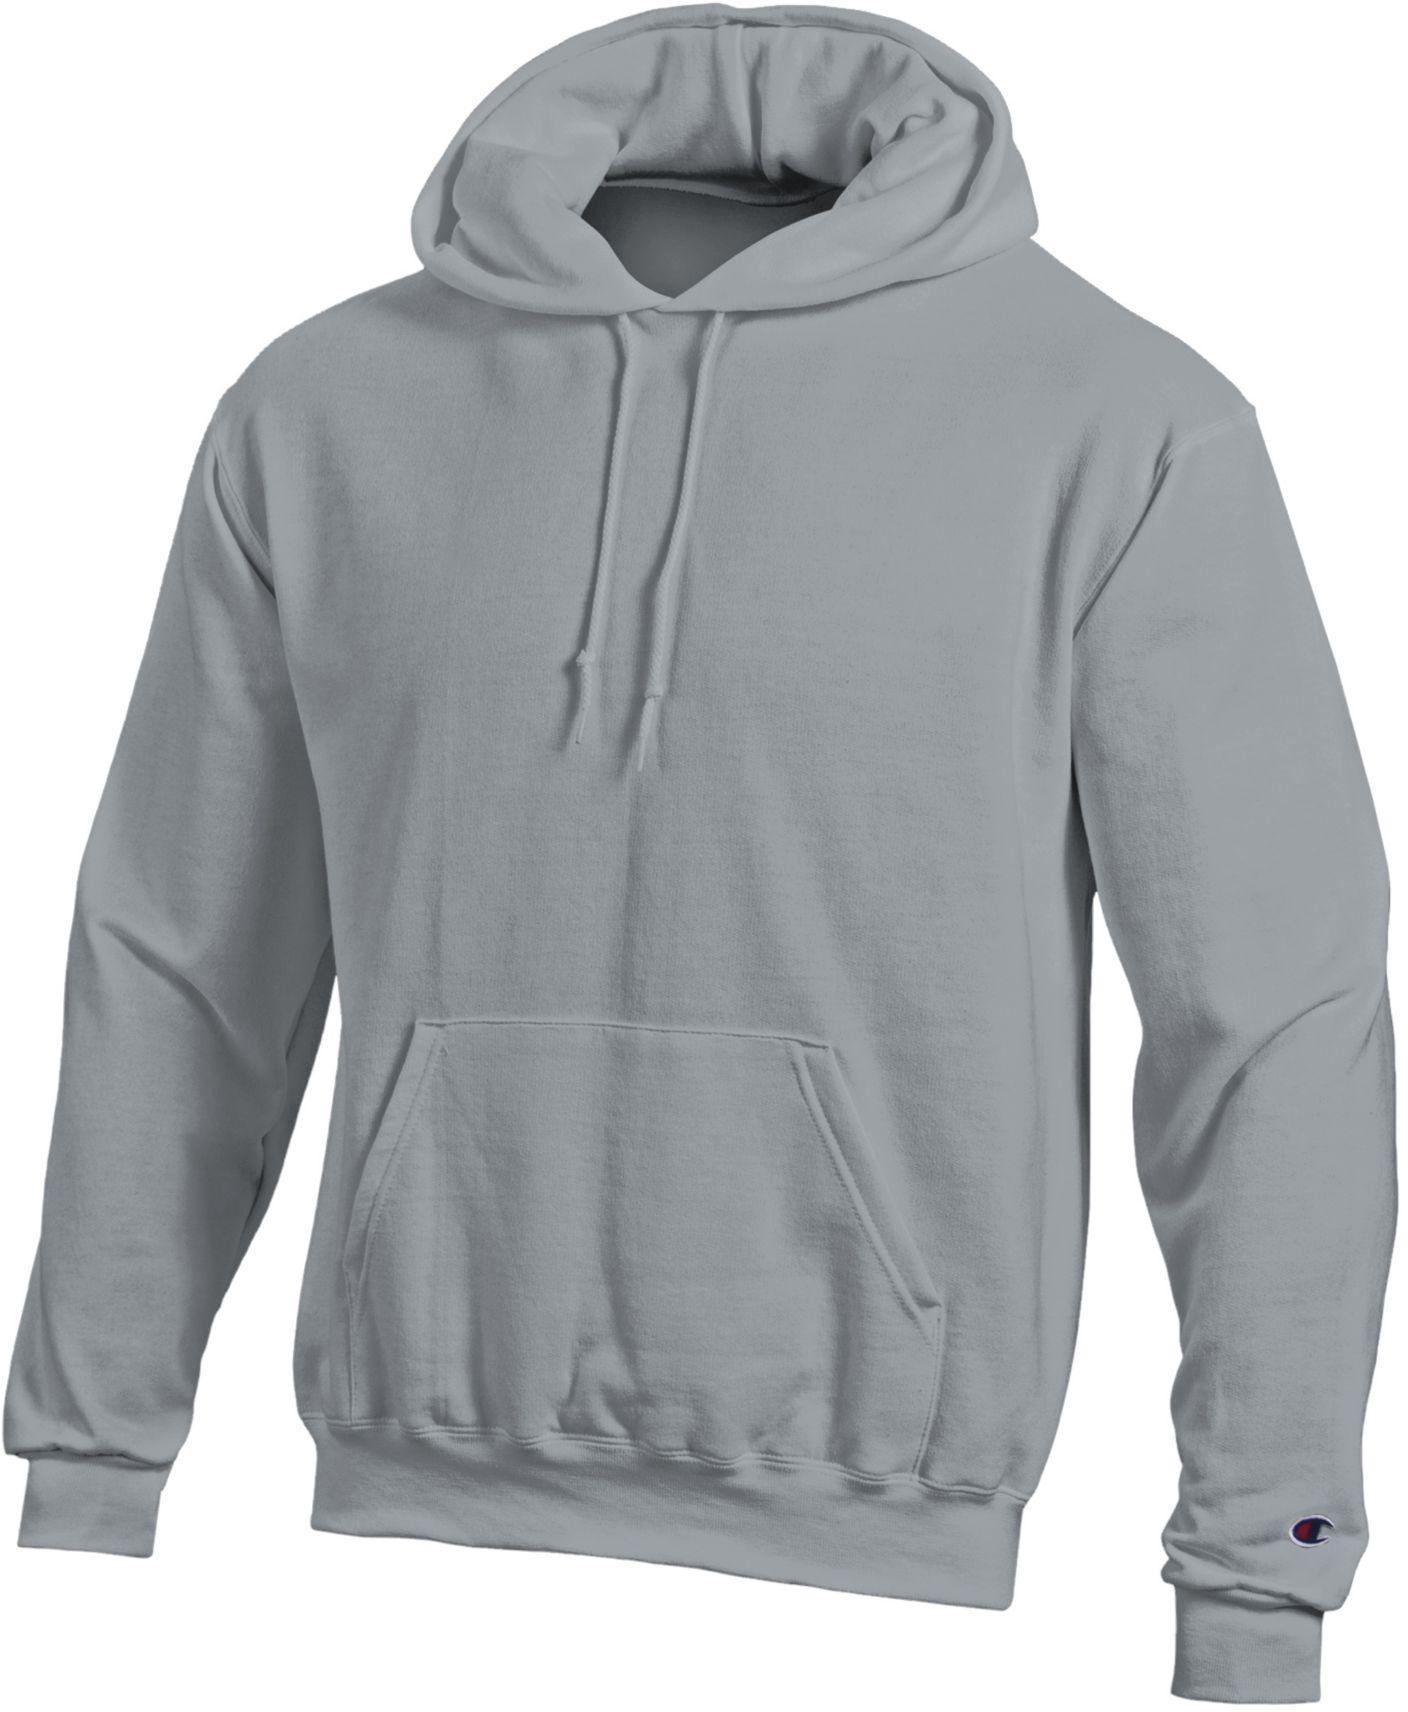 CHAMPION Double Dry Action Fleece Pullover Hood - S700 | eBay